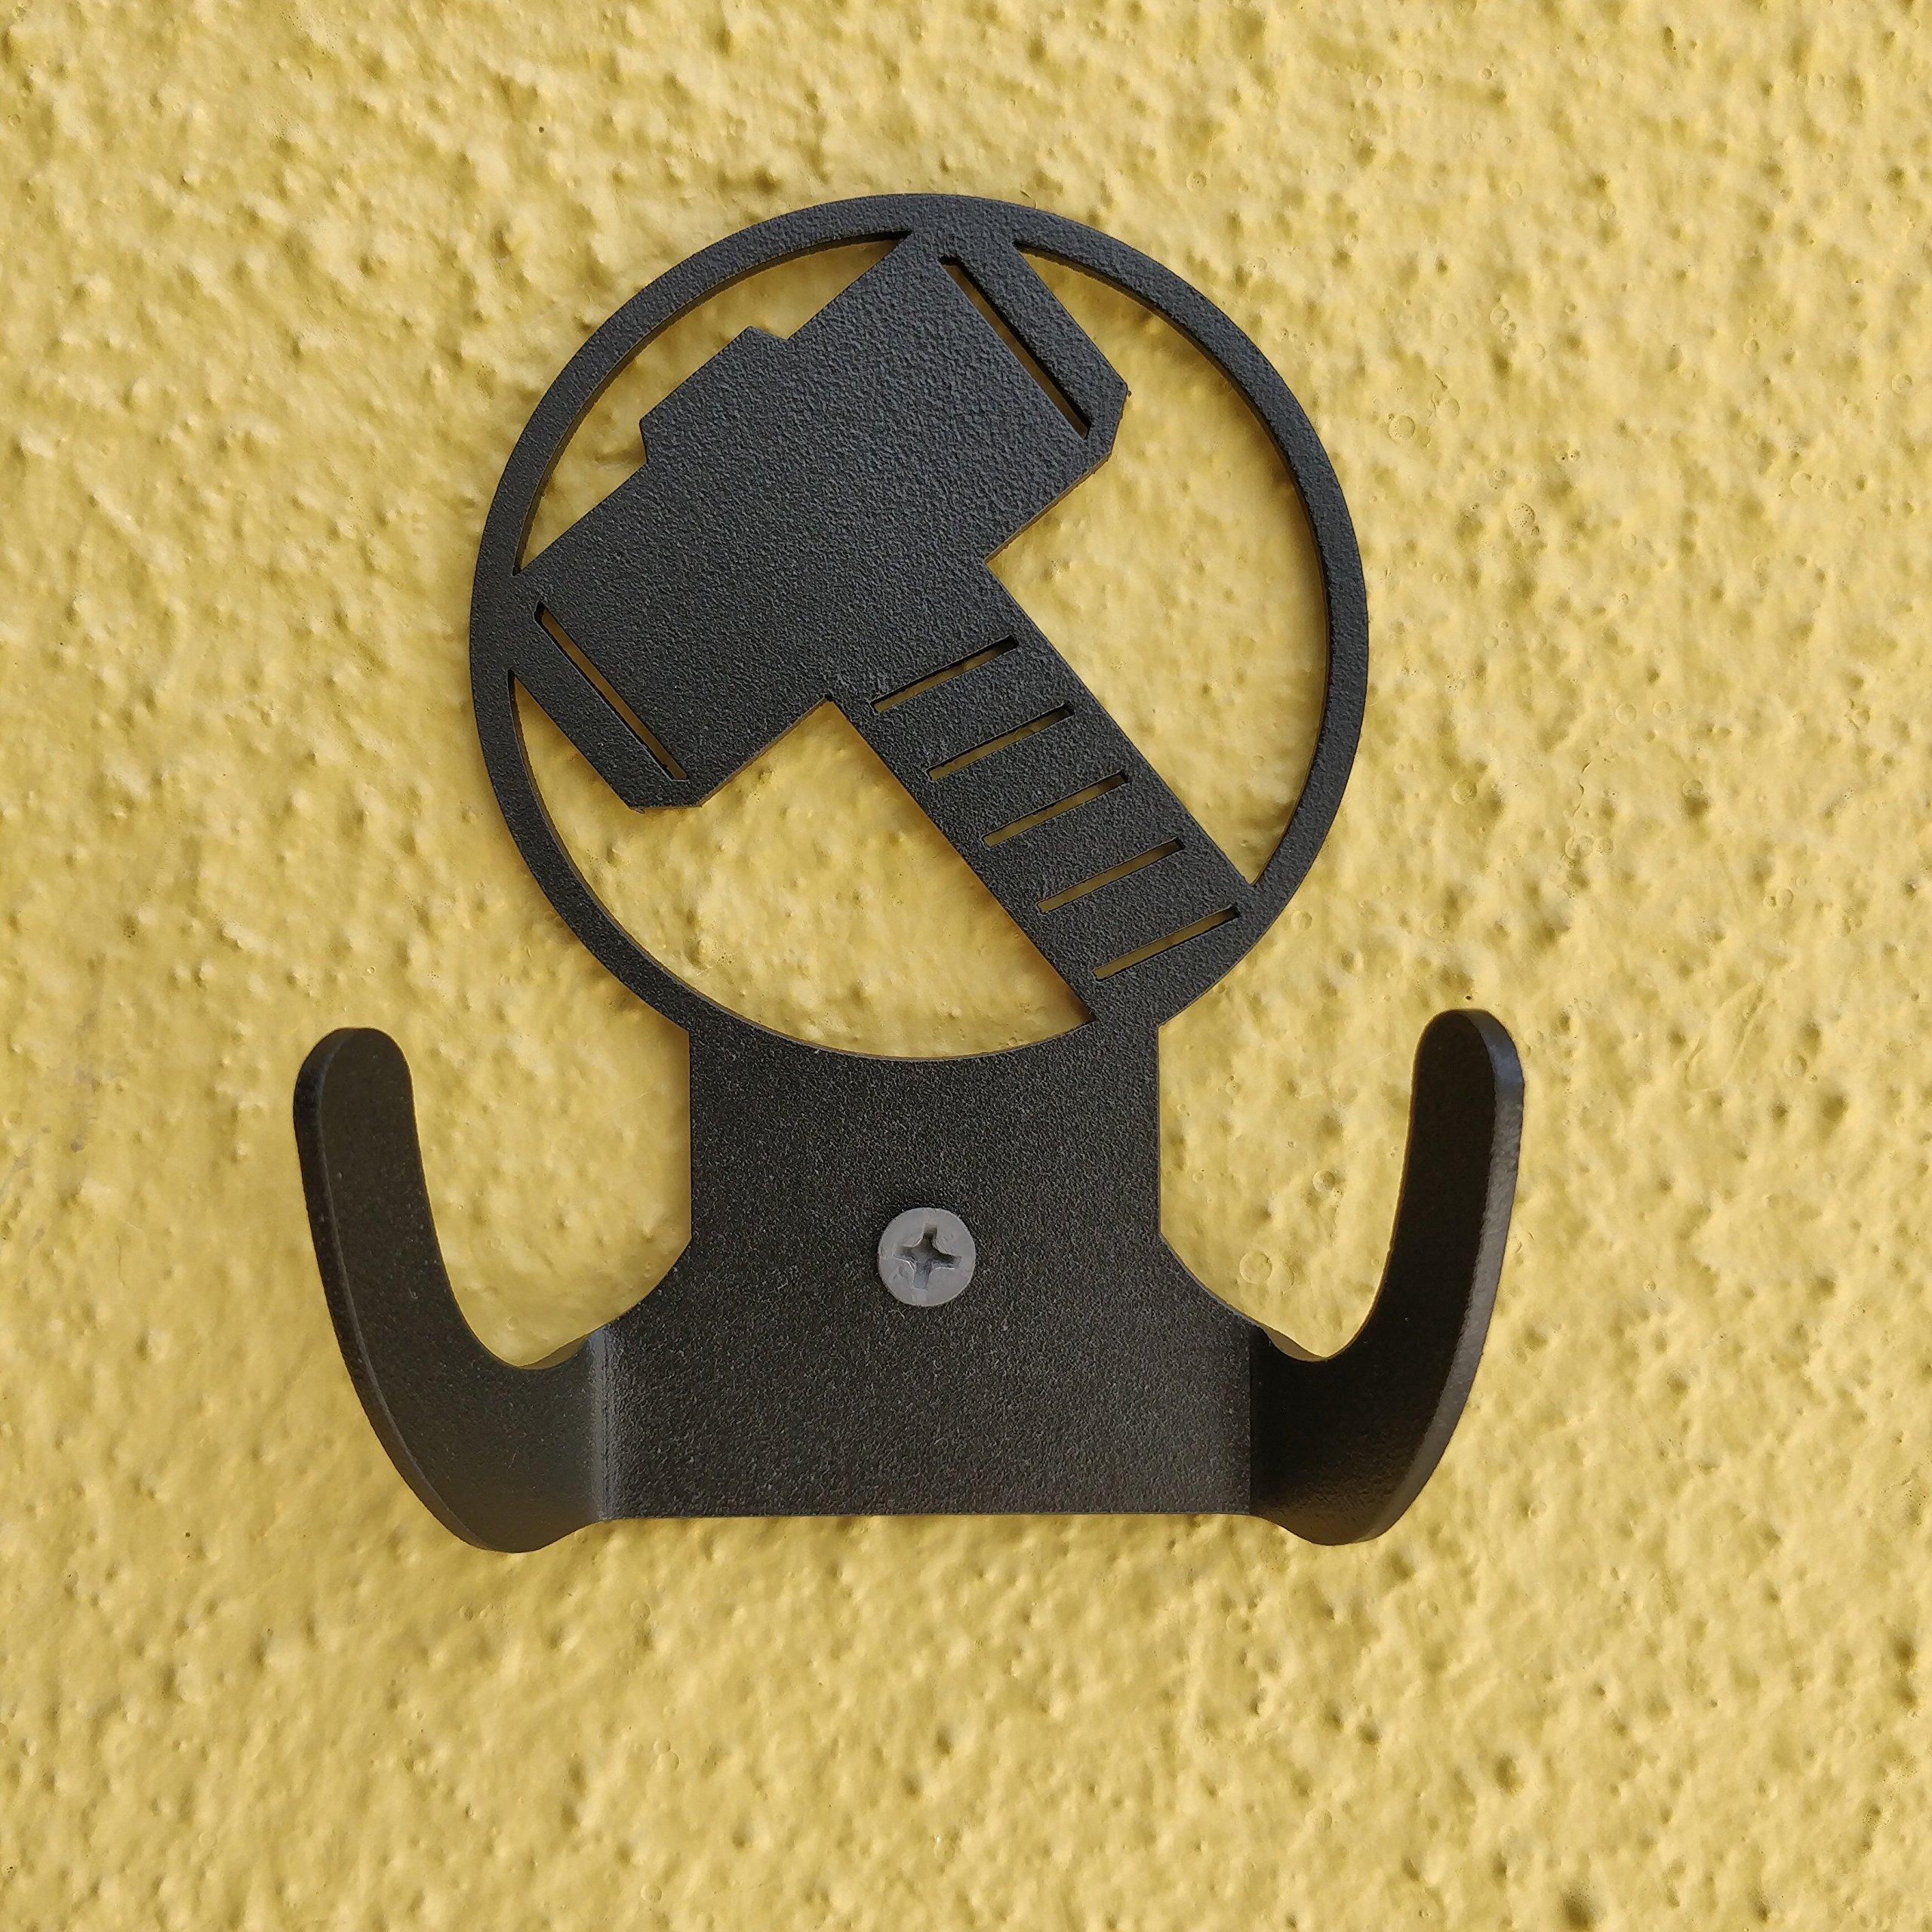 HeavenlyKraft Thor Logo Steel Wall Hook Dual Holder for Living Room Coat Hat Robe Hanger Bathroom Towel Kitchen Strong Heavy Duty Garage Storage Organizer Utensil Hook Single, 4 X 3.14 X 1.4 Inch